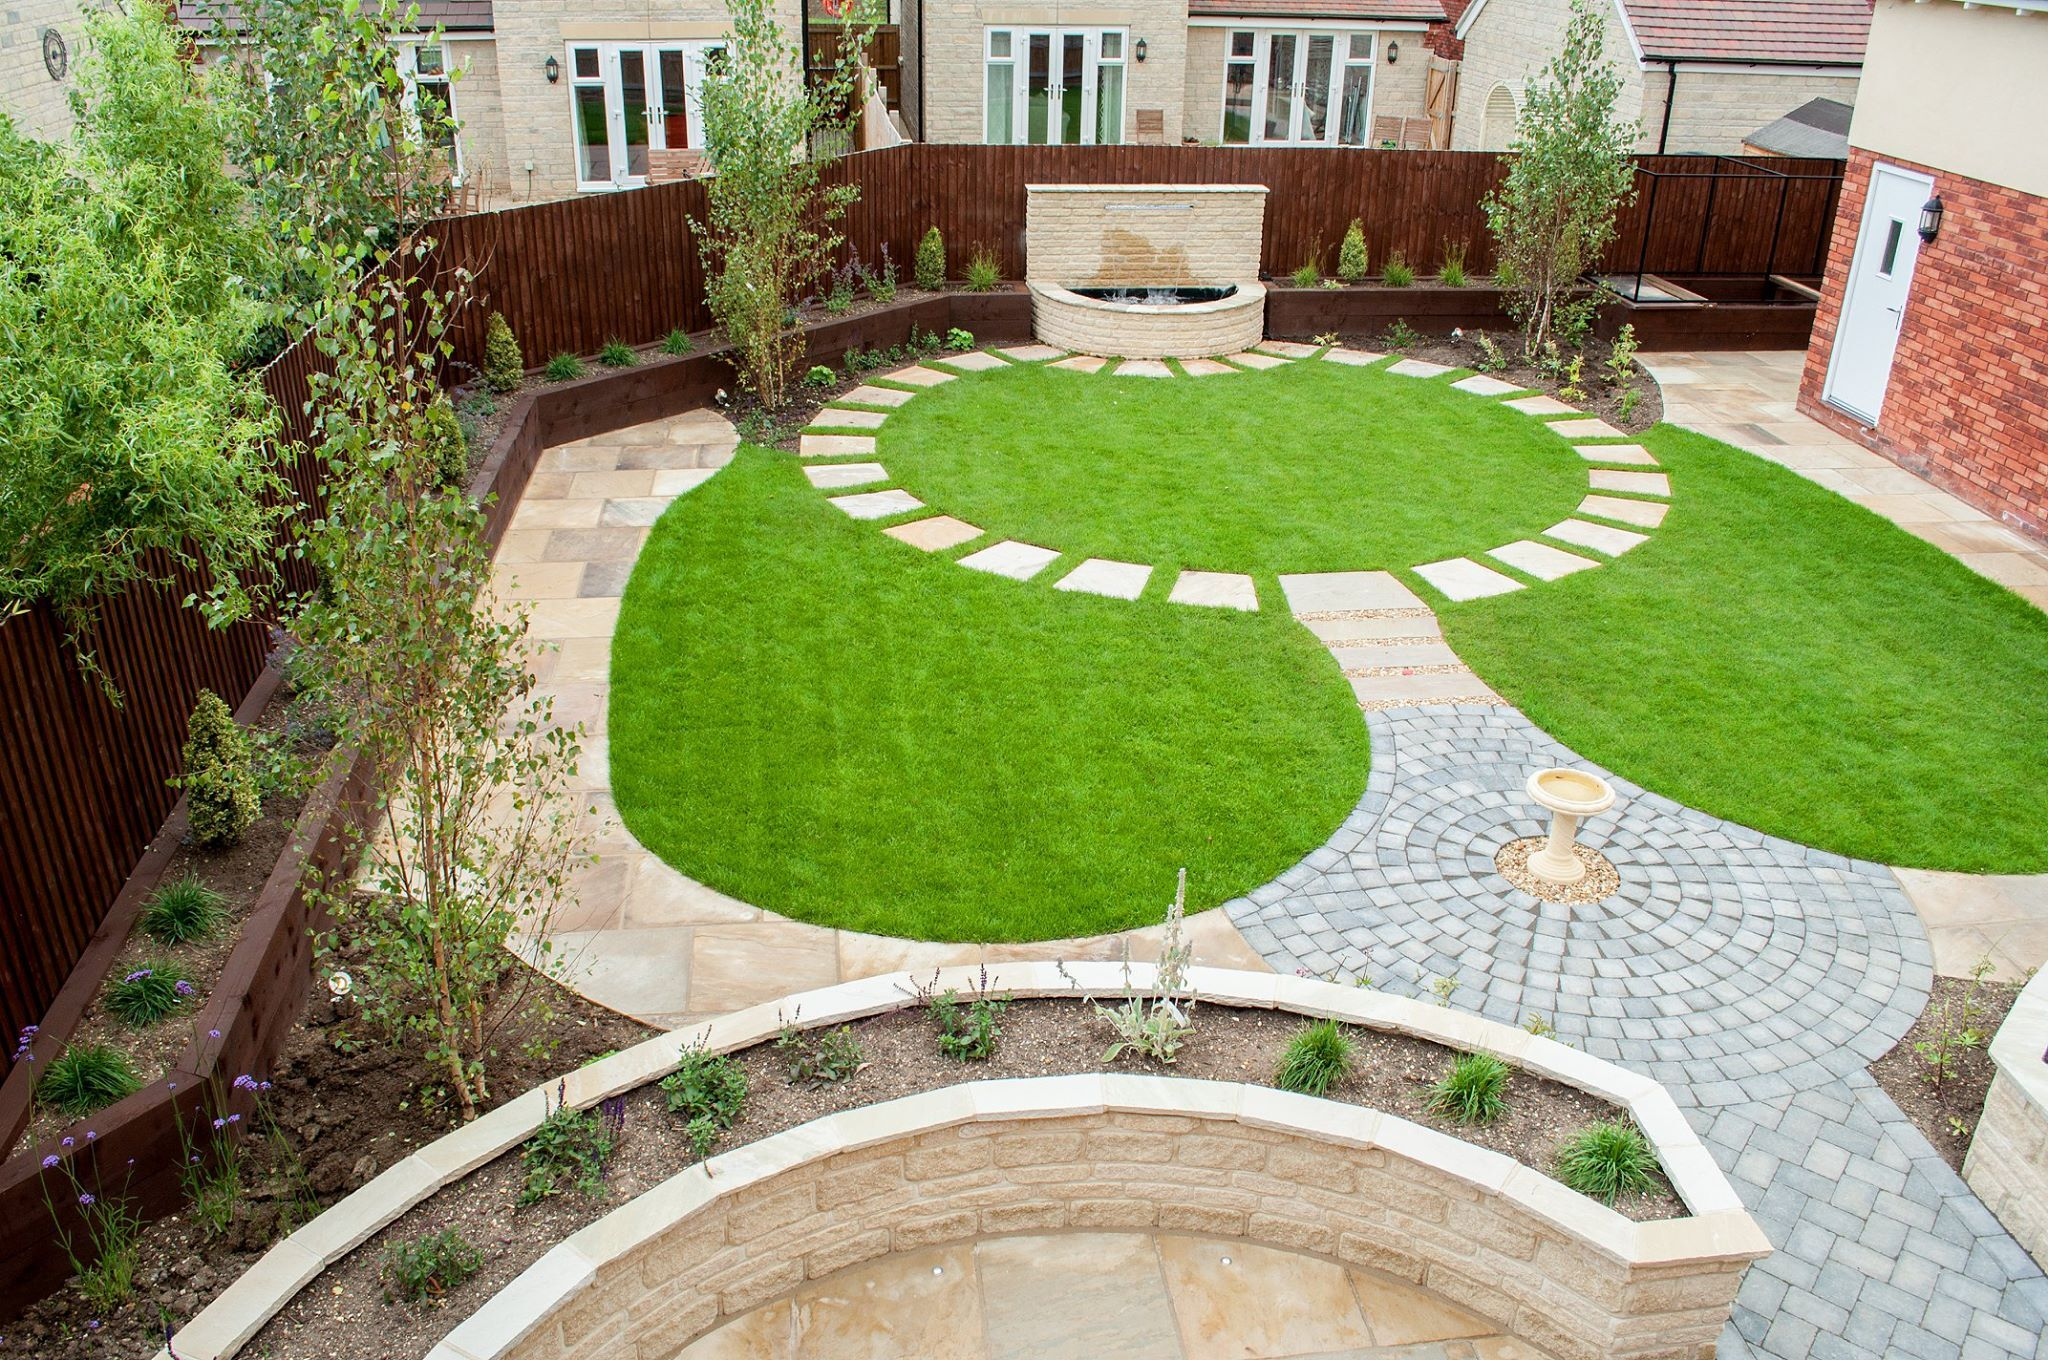 creative-round-paved-pathway